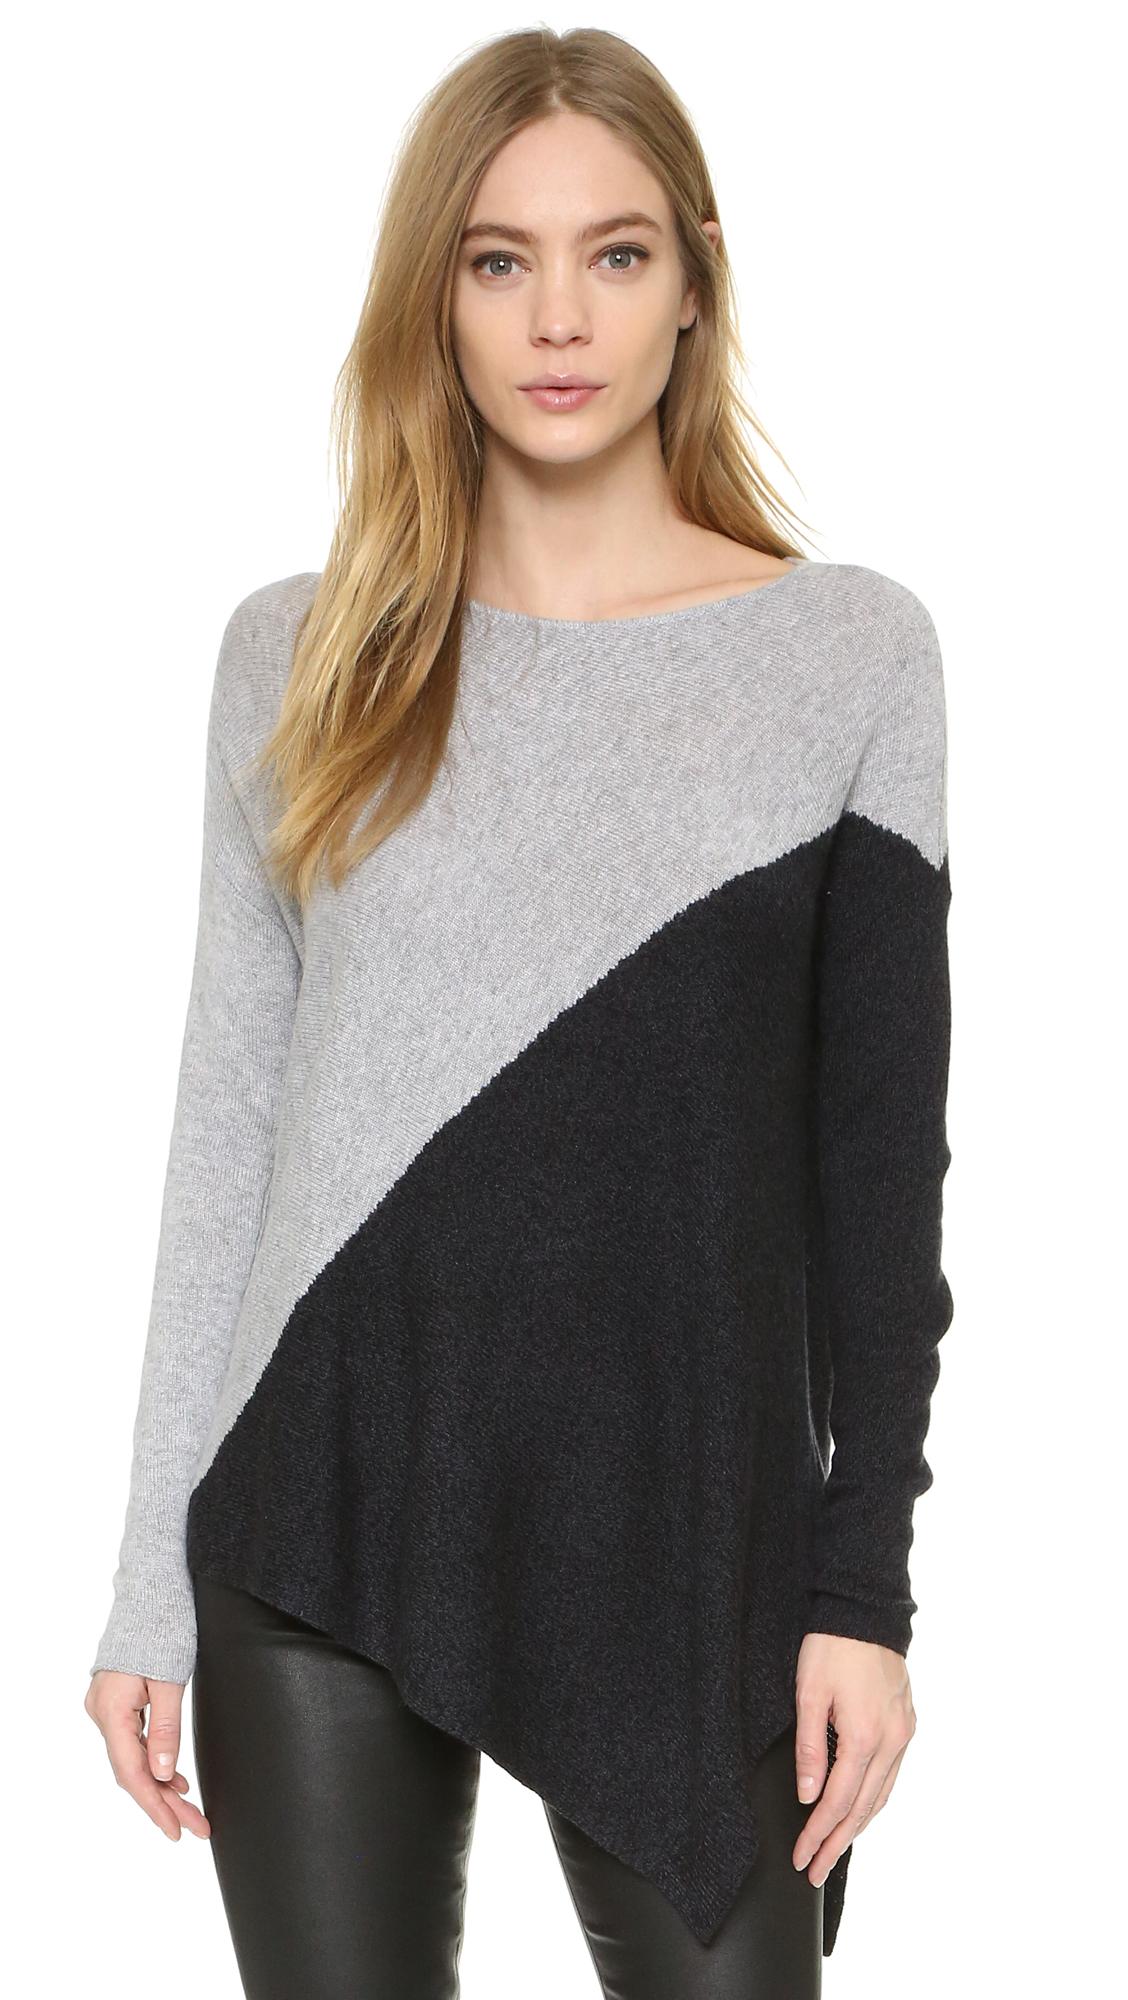 Alice + Olivia Colorblocked Bias Boxy Pullover - Grey/Charcoal at Shopbop